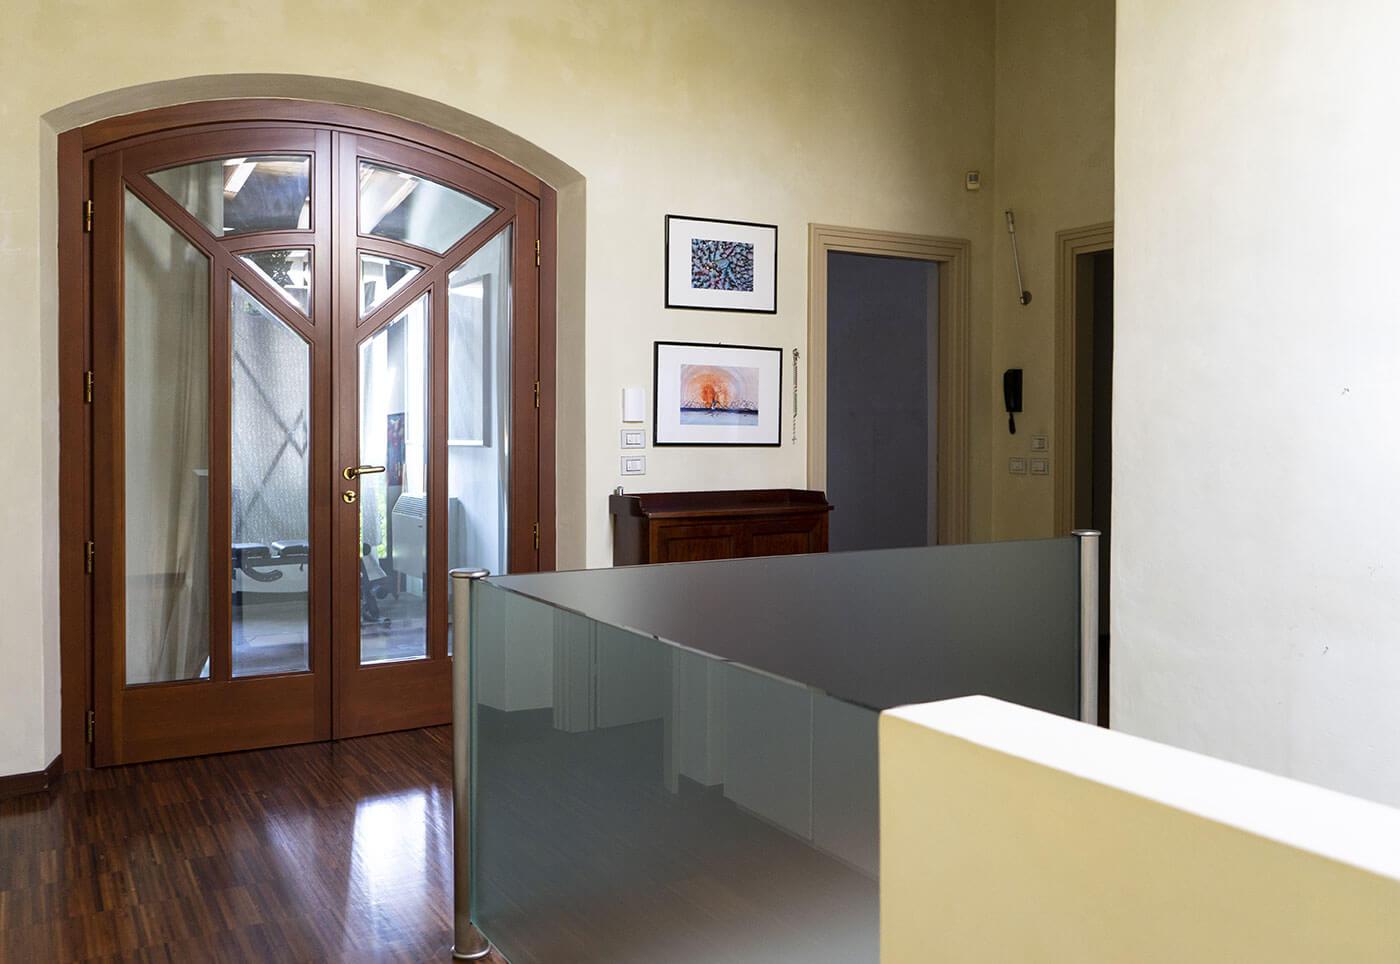 fotografie interior immobiliare